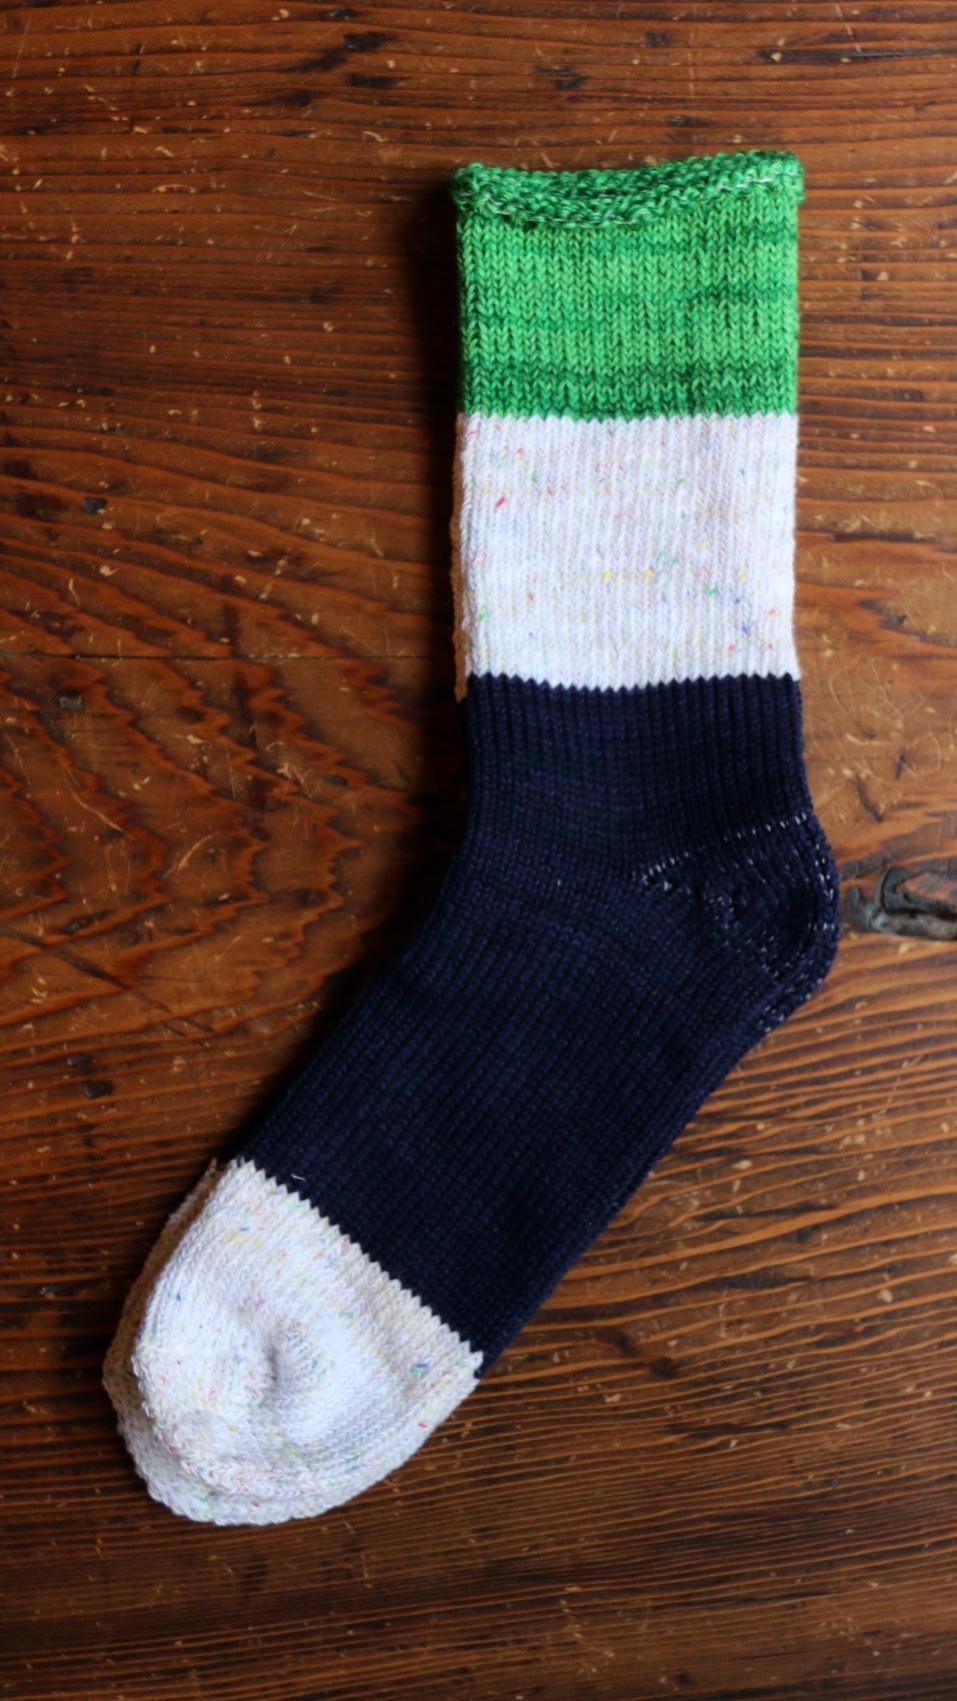 ASEEDONCLOUD/アシードンクラウド seasonal socks  / GREEN ♯201001